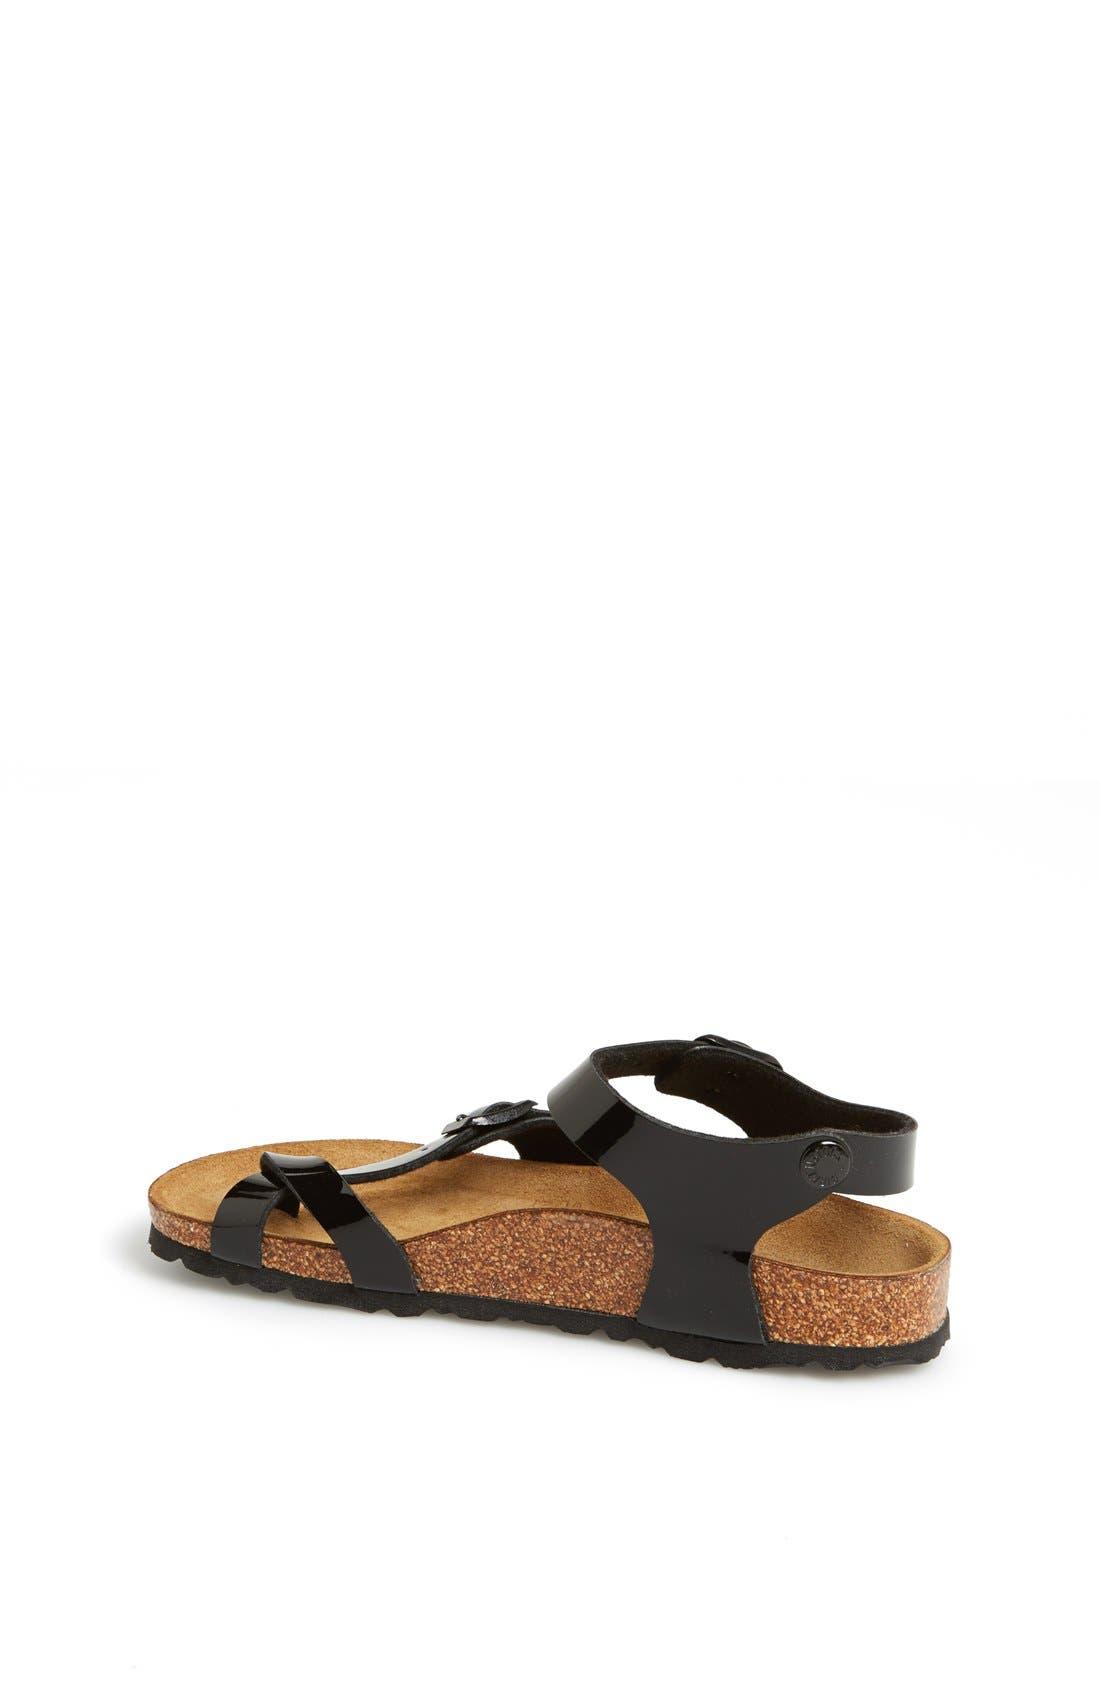 Alternate Image 2  - Birkenstock 'Taormina' Patent Sandal (Walker, Toddler & Little Kid)